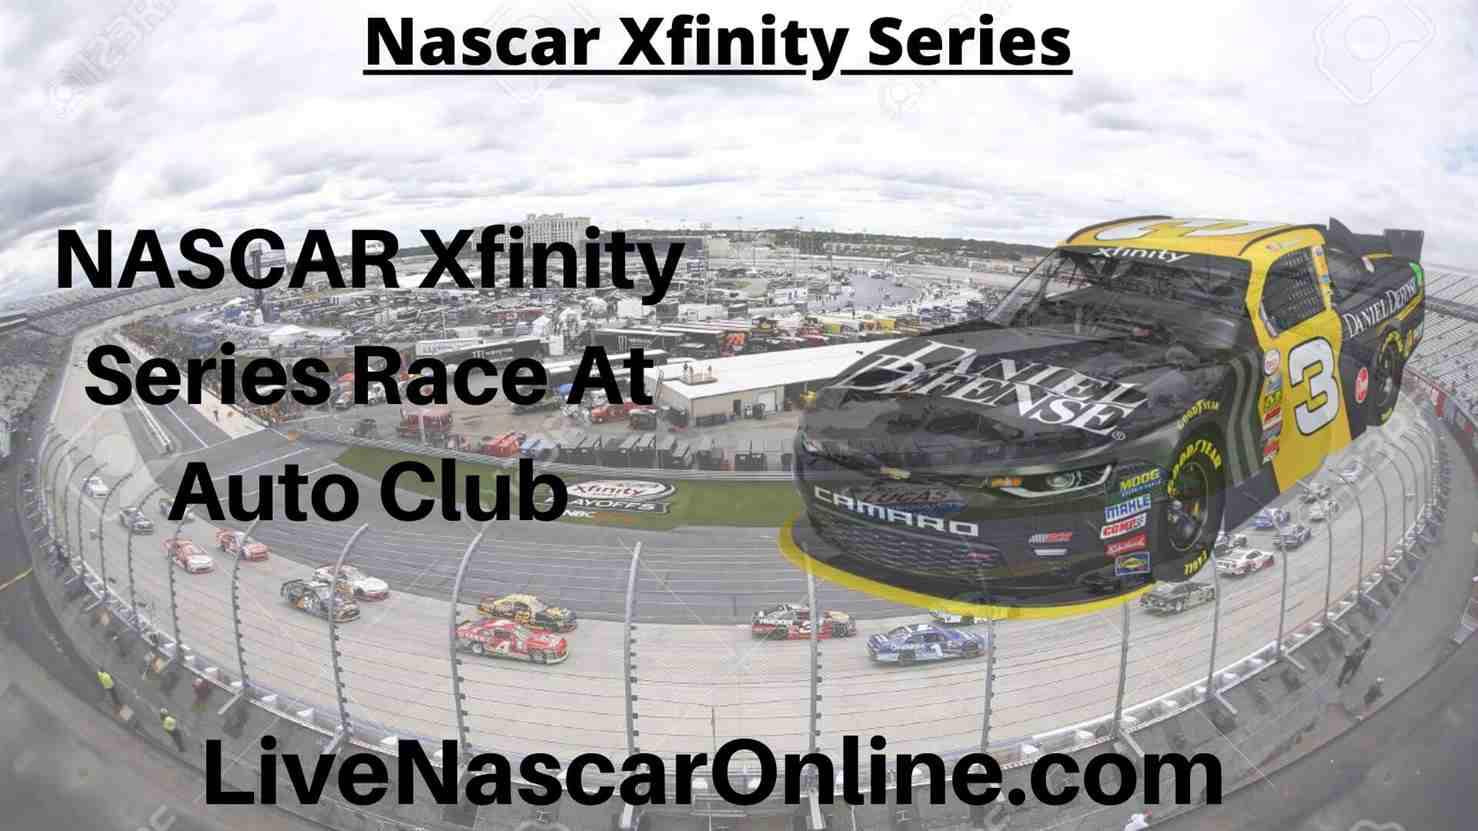 NASCAR Xfinity Series Race At Auto Club Online Stream | NASCAR Auto Club 2020